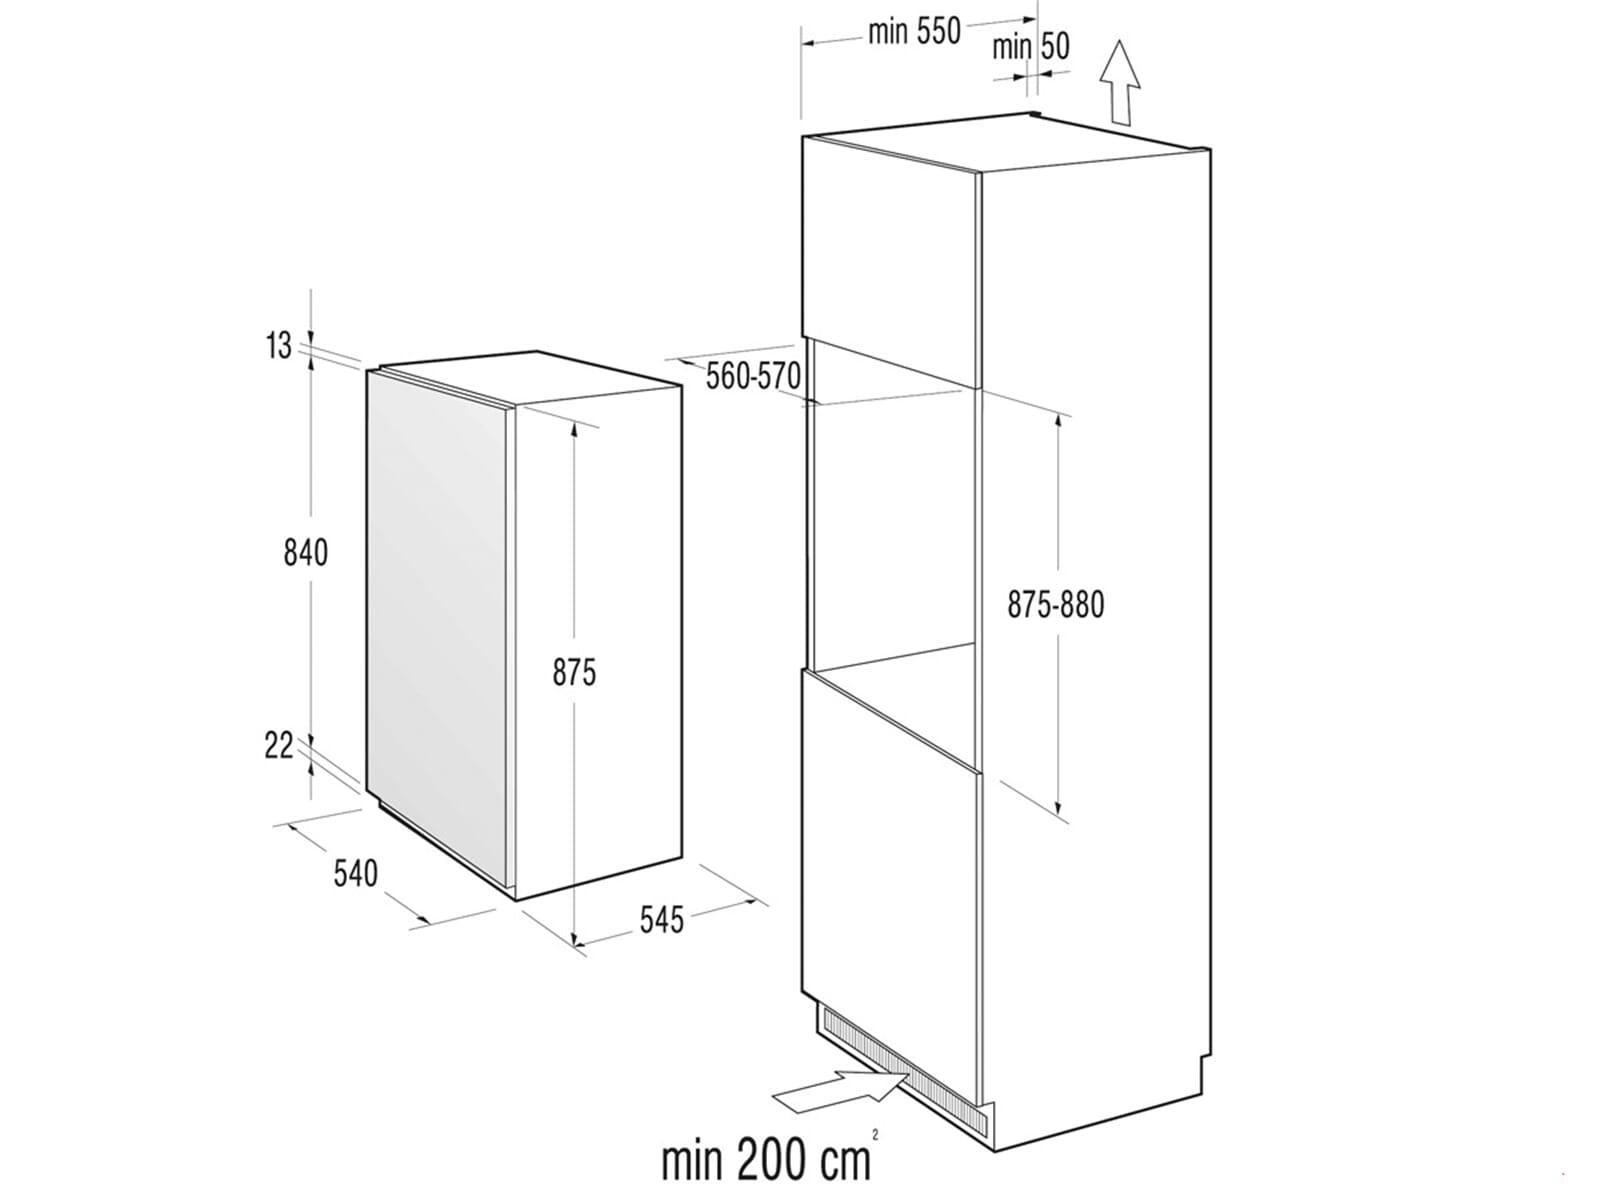 gorenje ri 4092 aw einbauk hlschrank. Black Bedroom Furniture Sets. Home Design Ideas